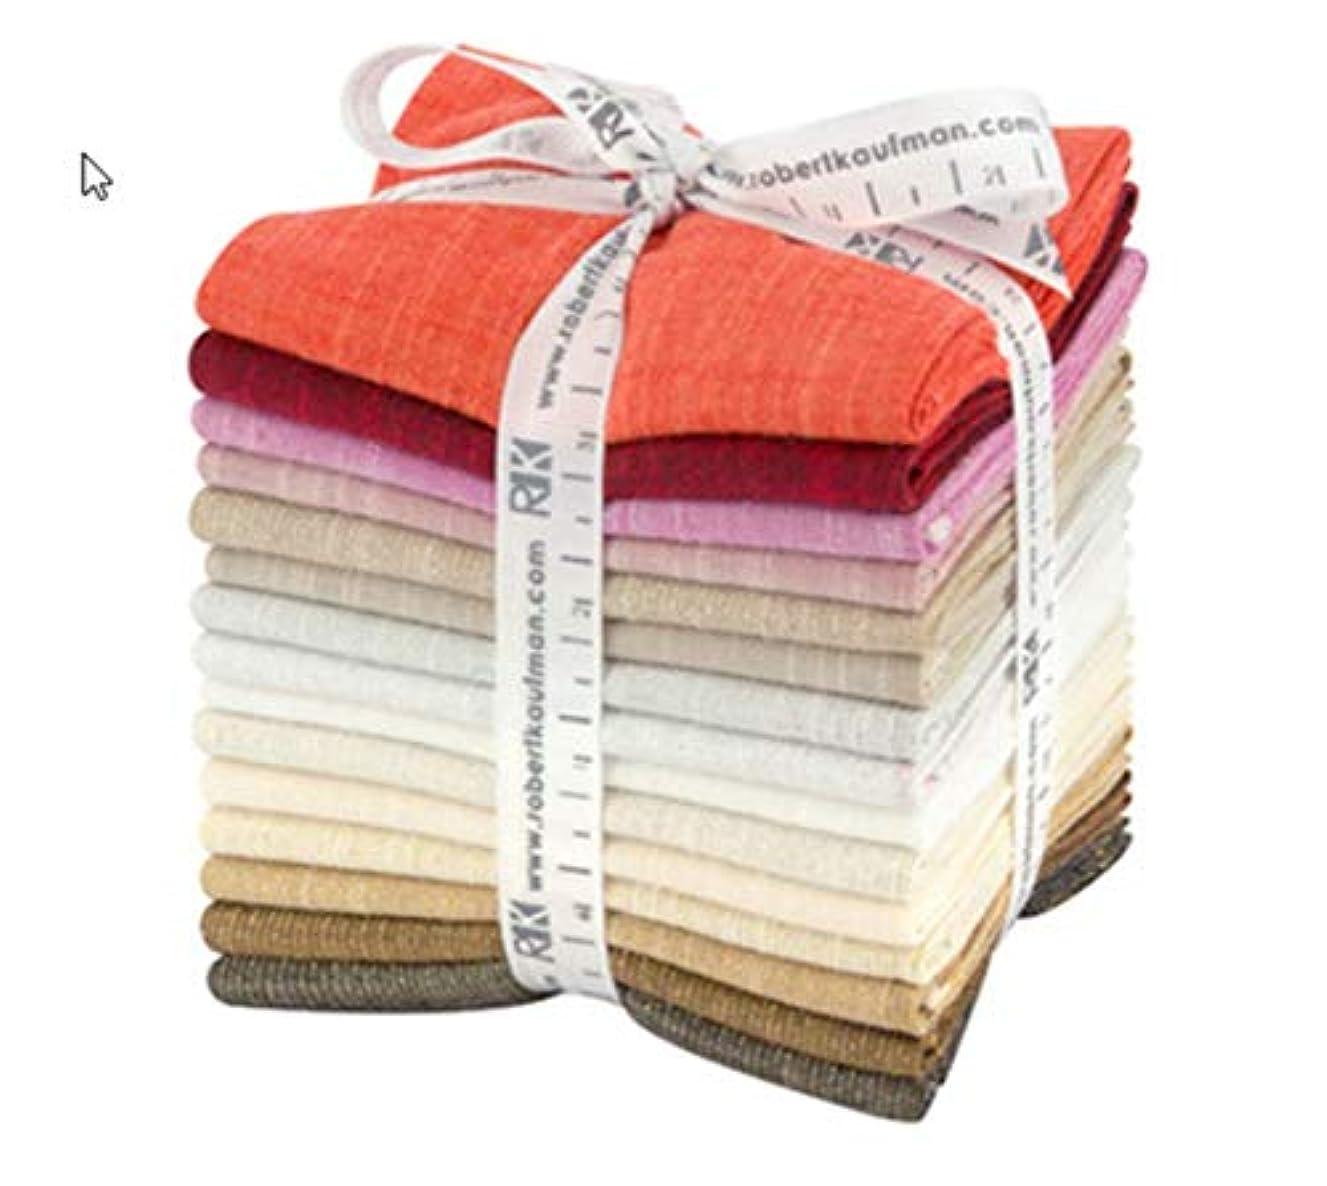 Manchester Warm 15 Fat Quarters Robert Kaufman Fabrics FQ-1472-15